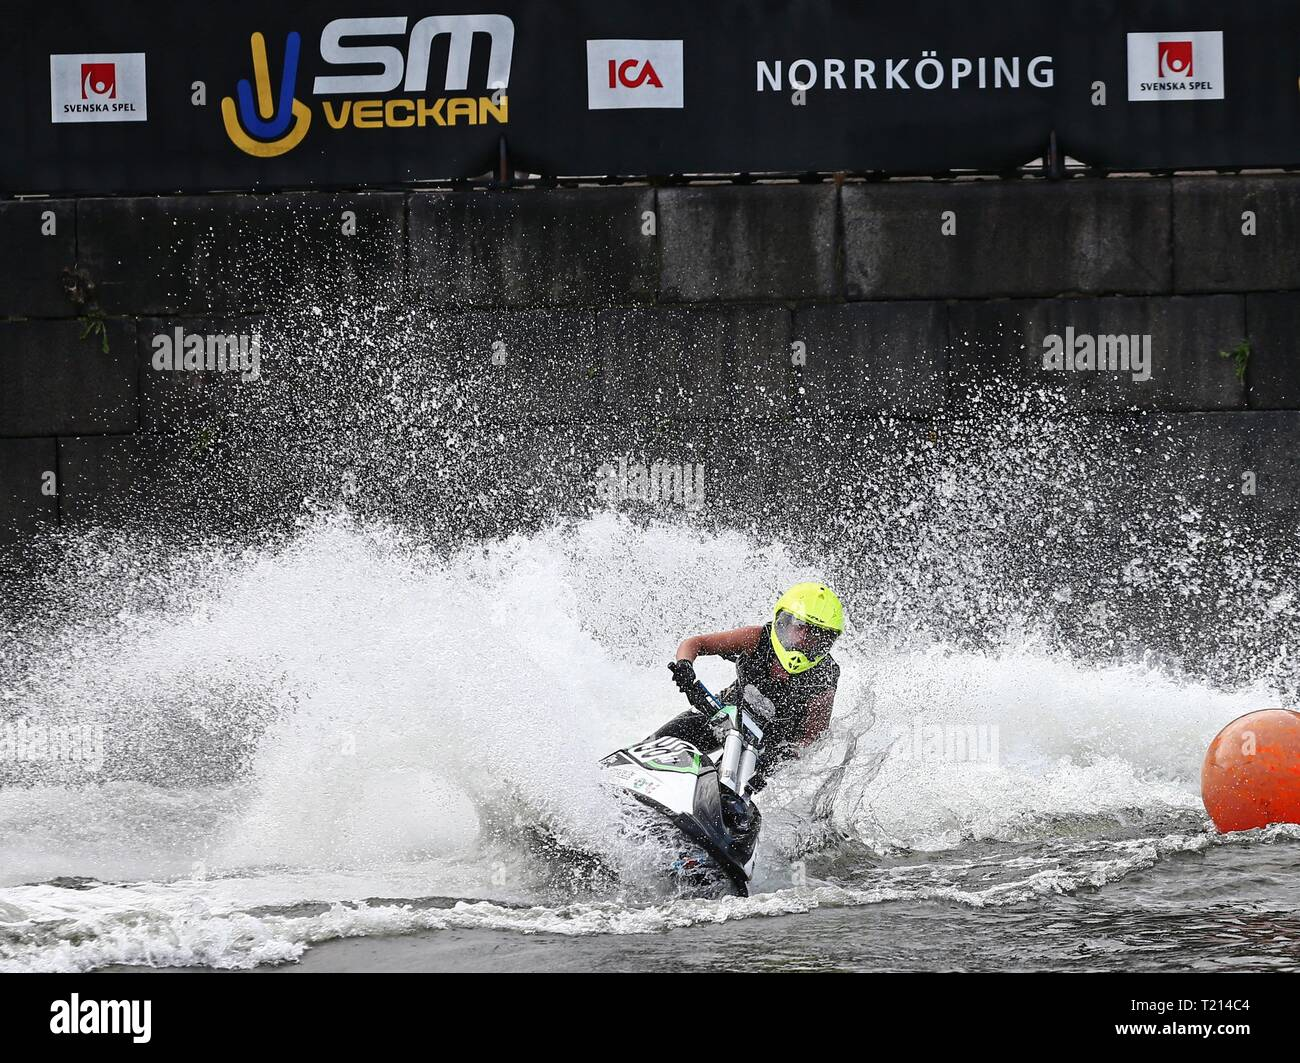 NORRKÖPING 2016-07-10 Nr 98 Emma-Nellie Örtendahl, Orust JSK, på Jetski i Motala ström SM veckan i Norrköping.       Foto Jeppe Gustafsson Stock Photo